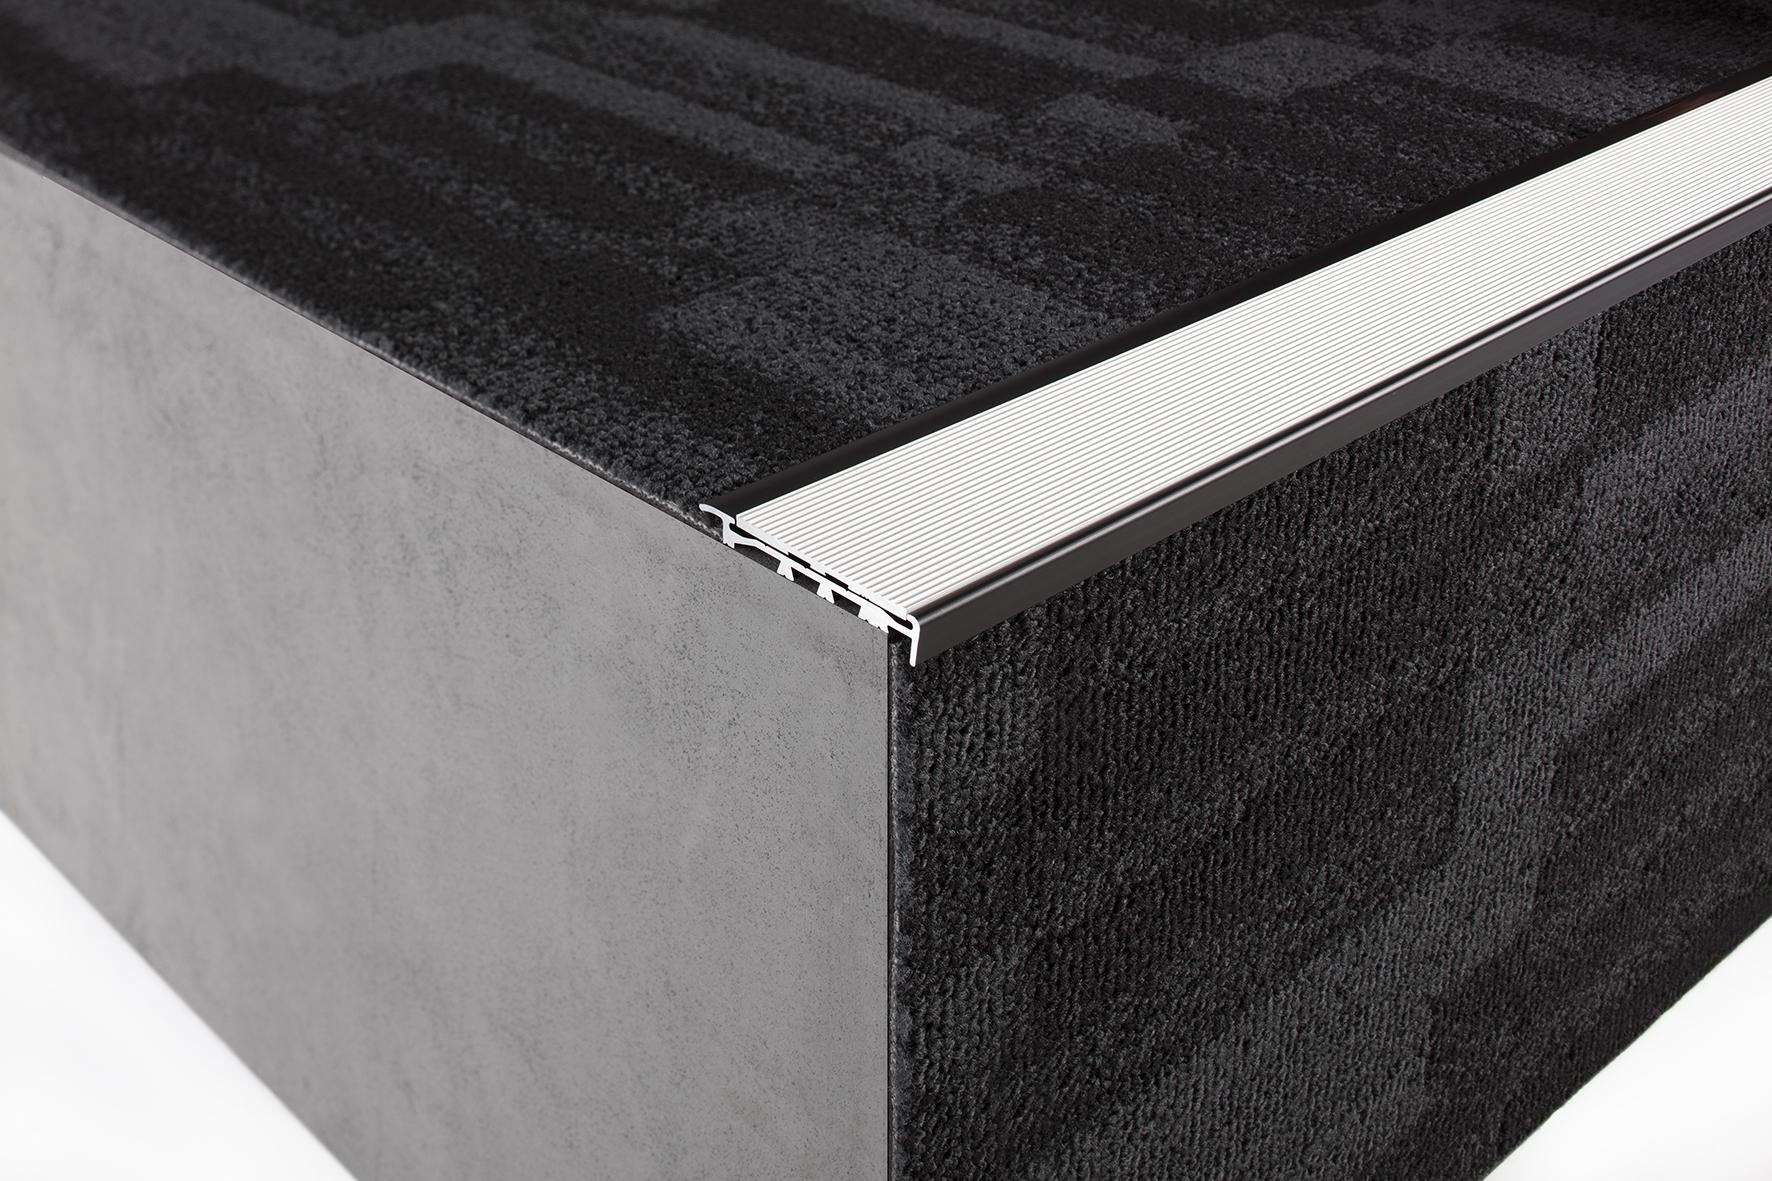 Carpet To Tile Transition >> FMD106 Tredfx Fusion Series